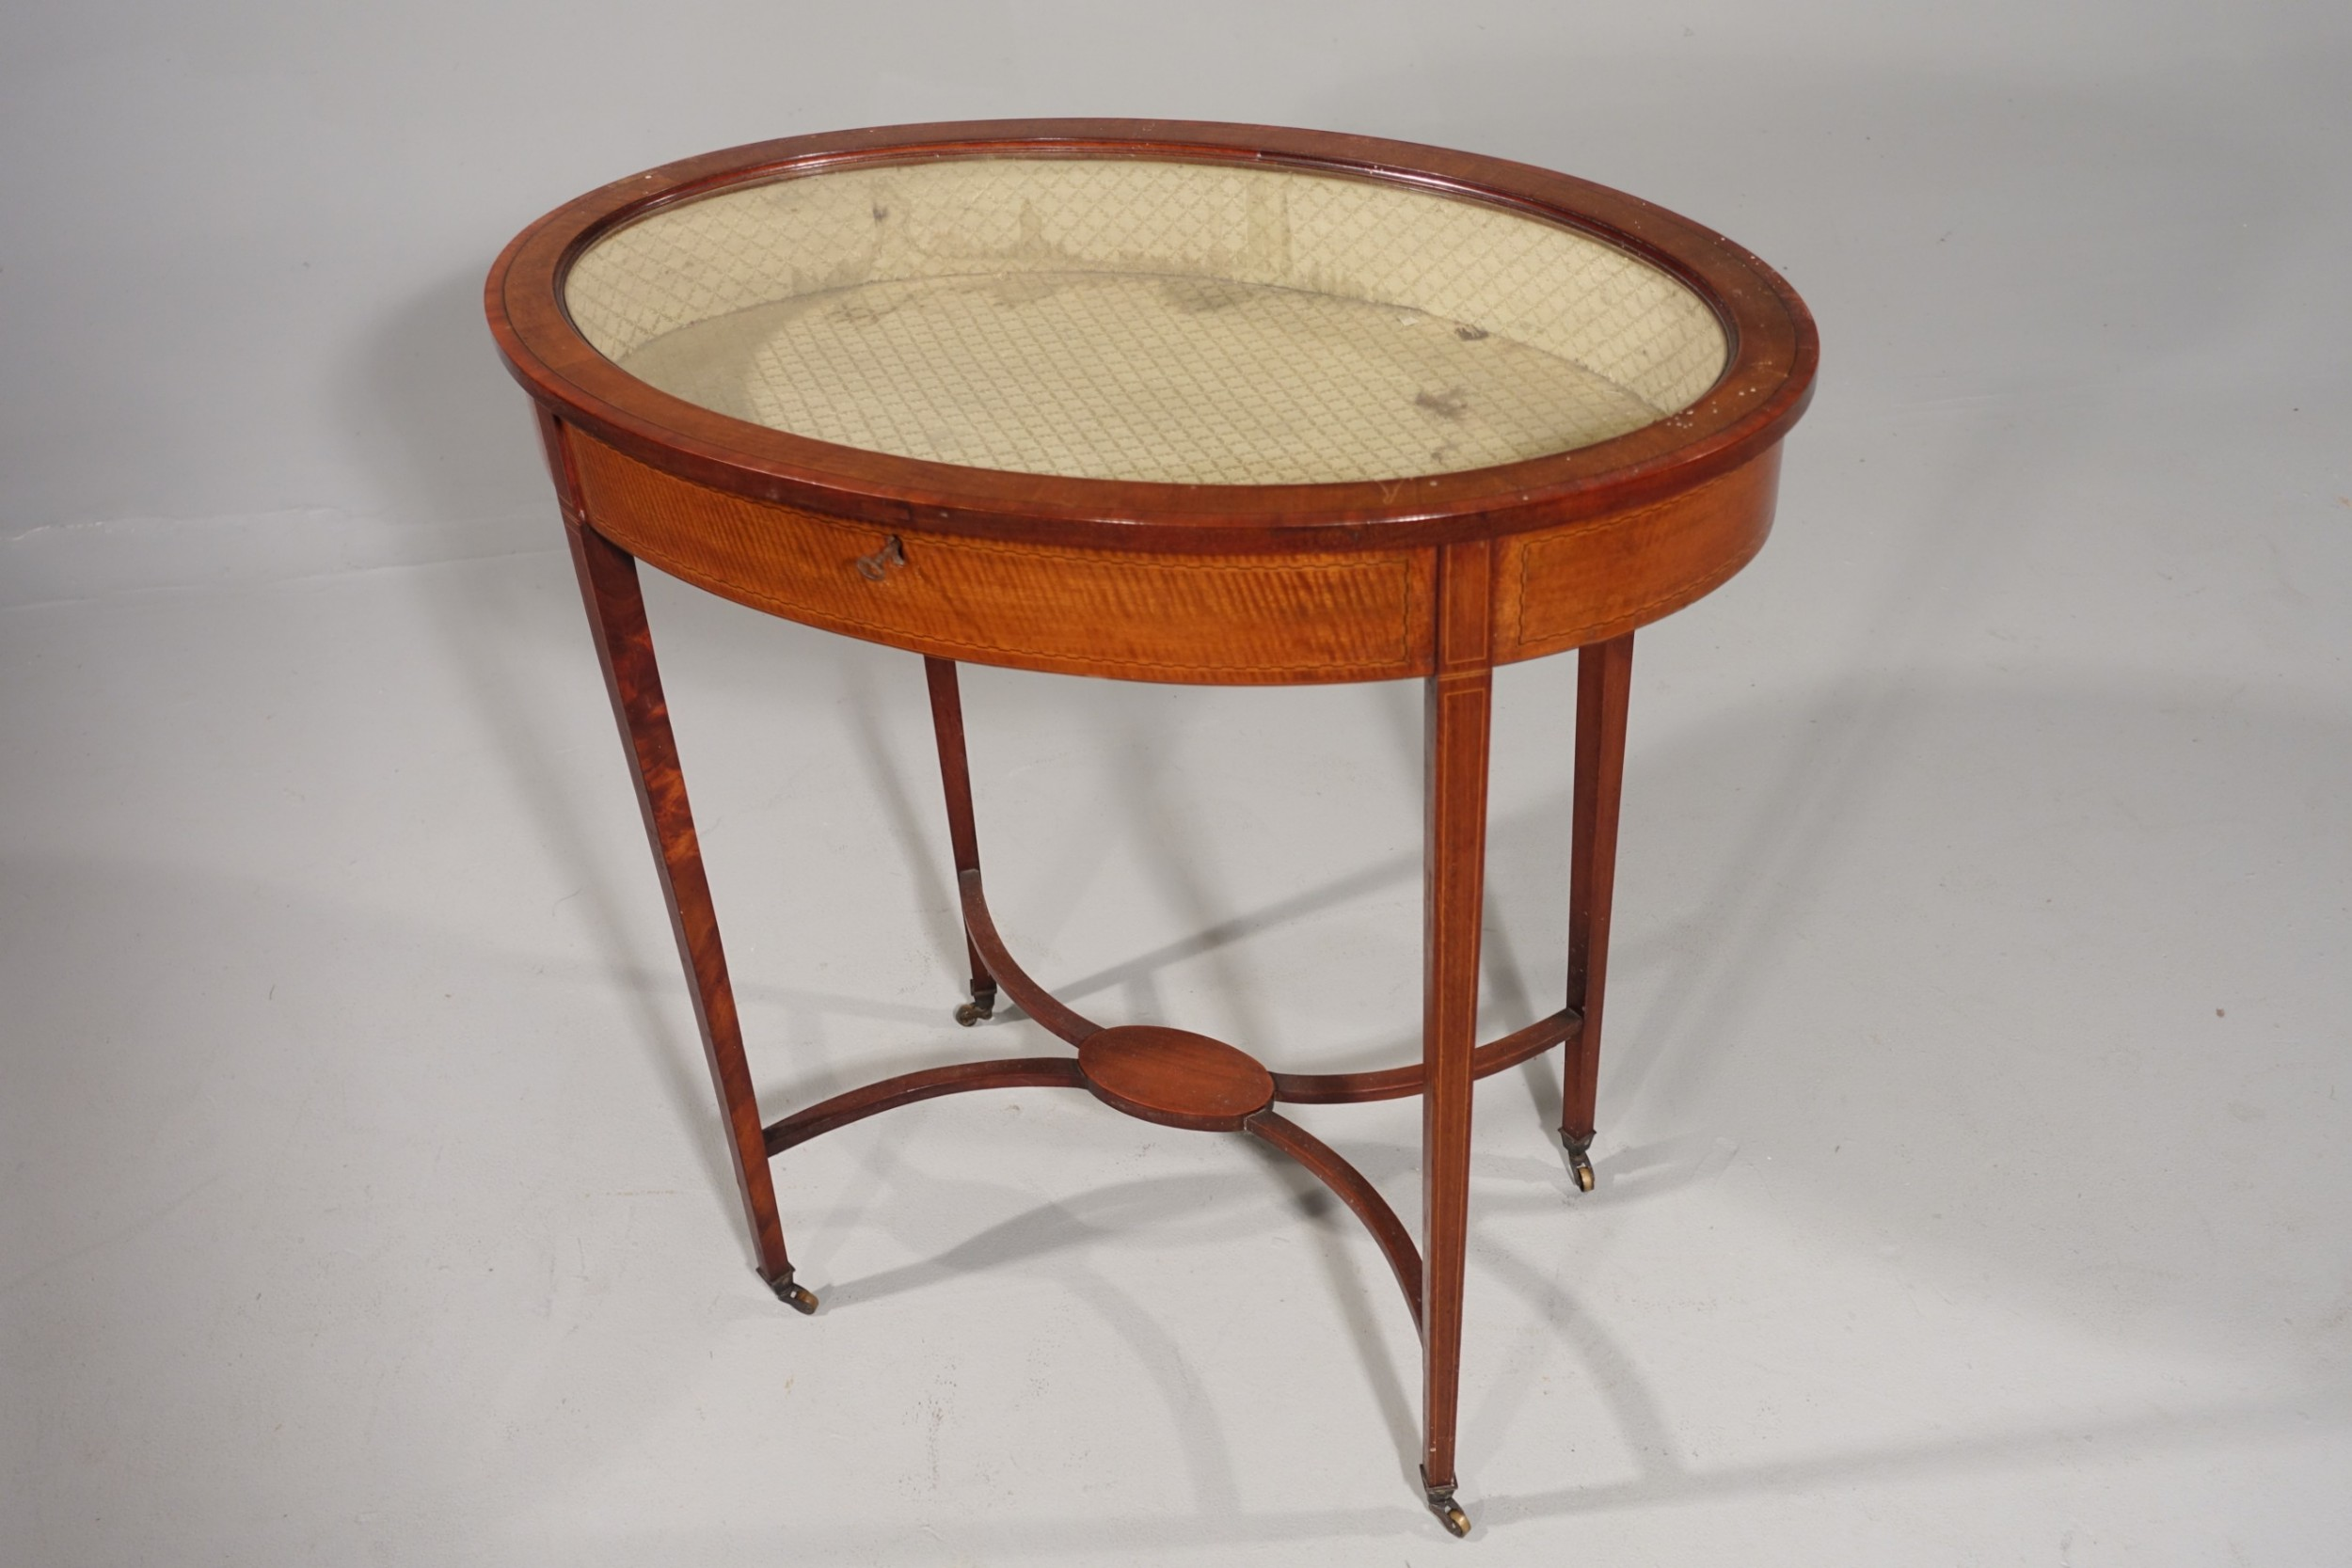 an edwardian period oval mahogany bijouterie table